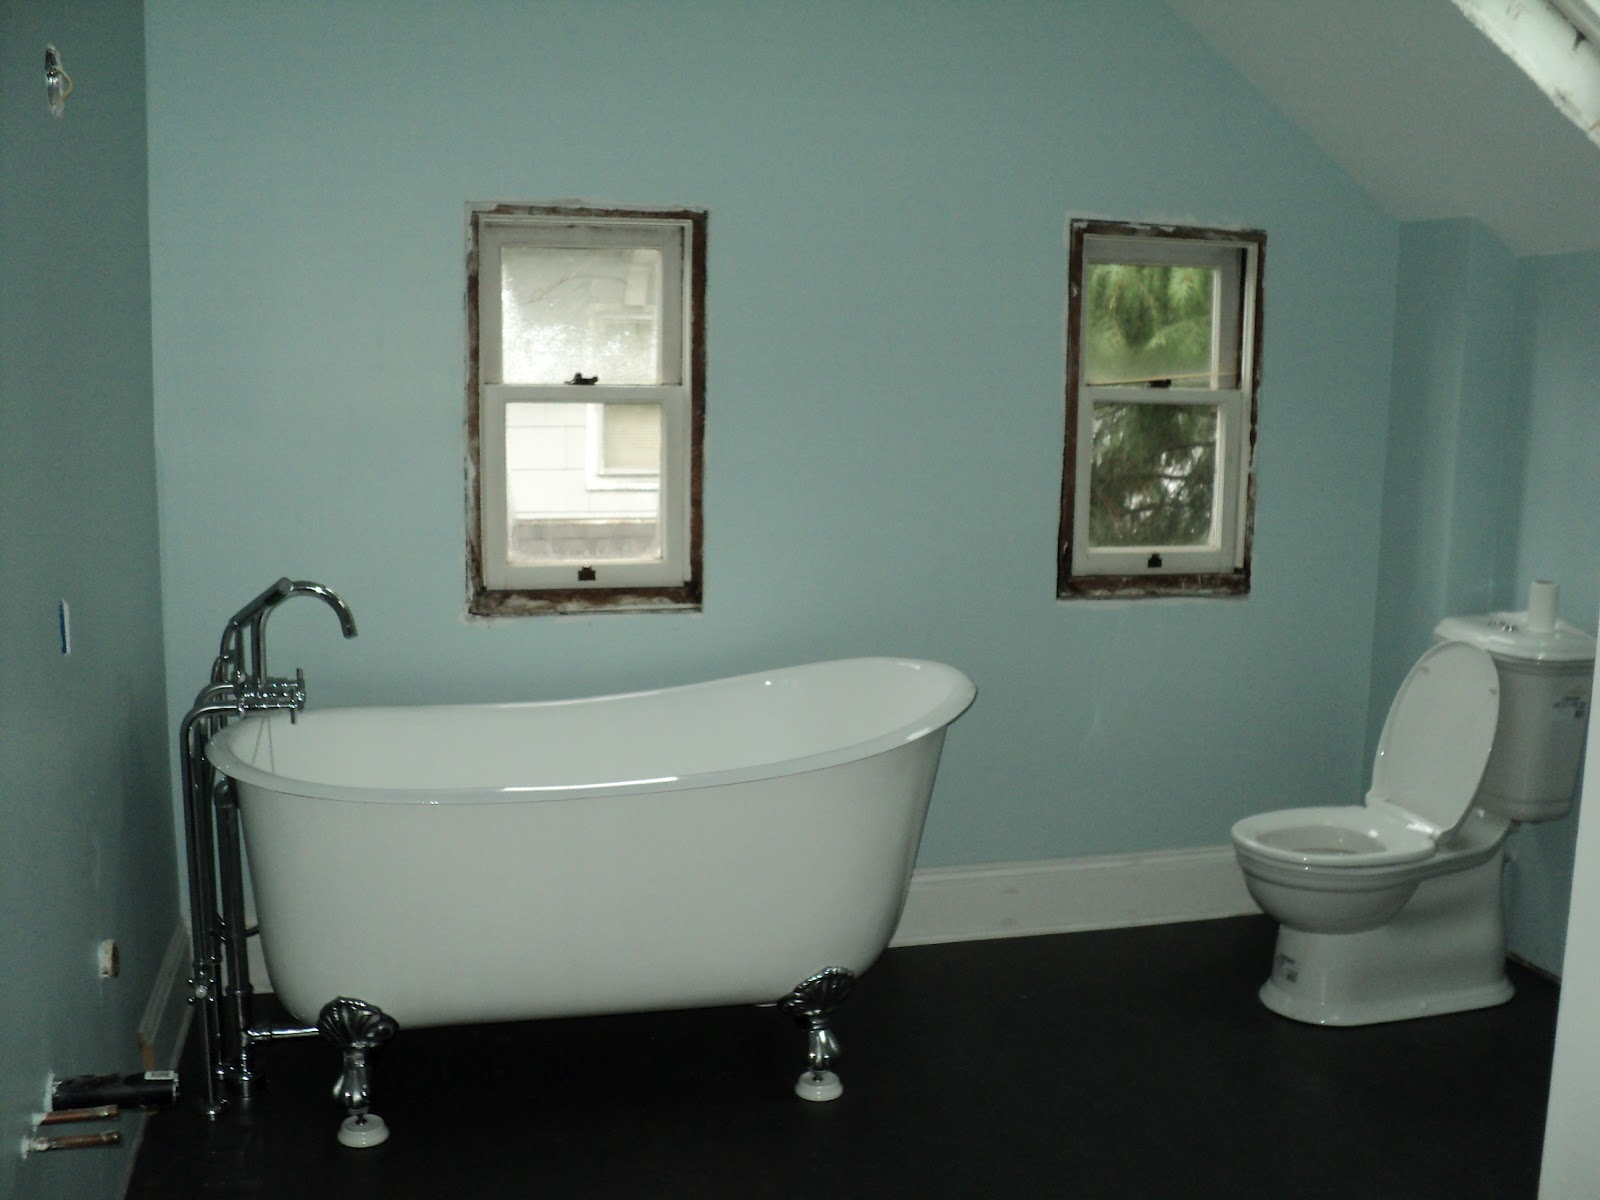 renters wallpaper sherwin - photo #2